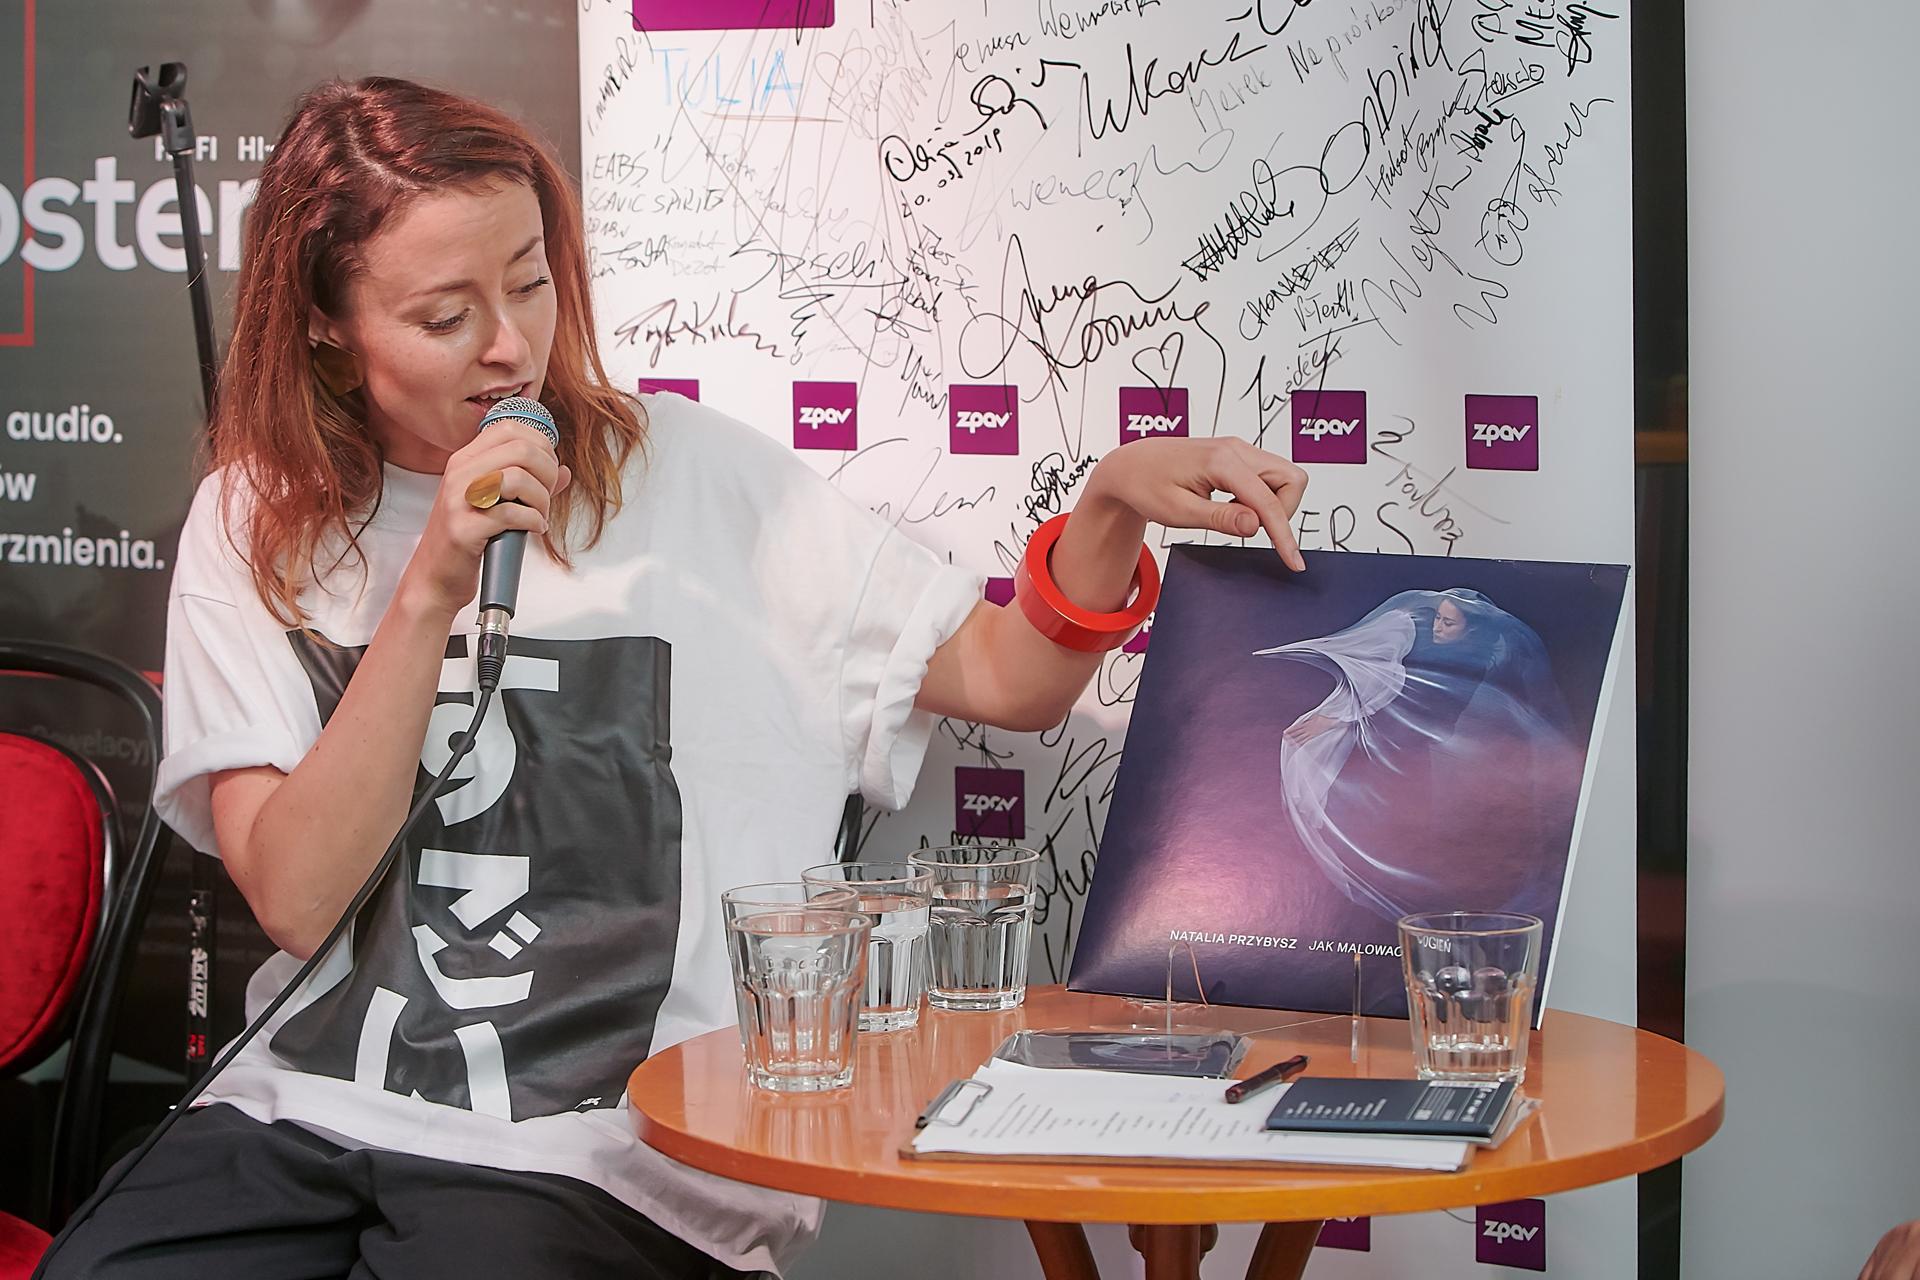 Prerelease of Natalia Przybysz's new album on ECO vinyl and ECO CD